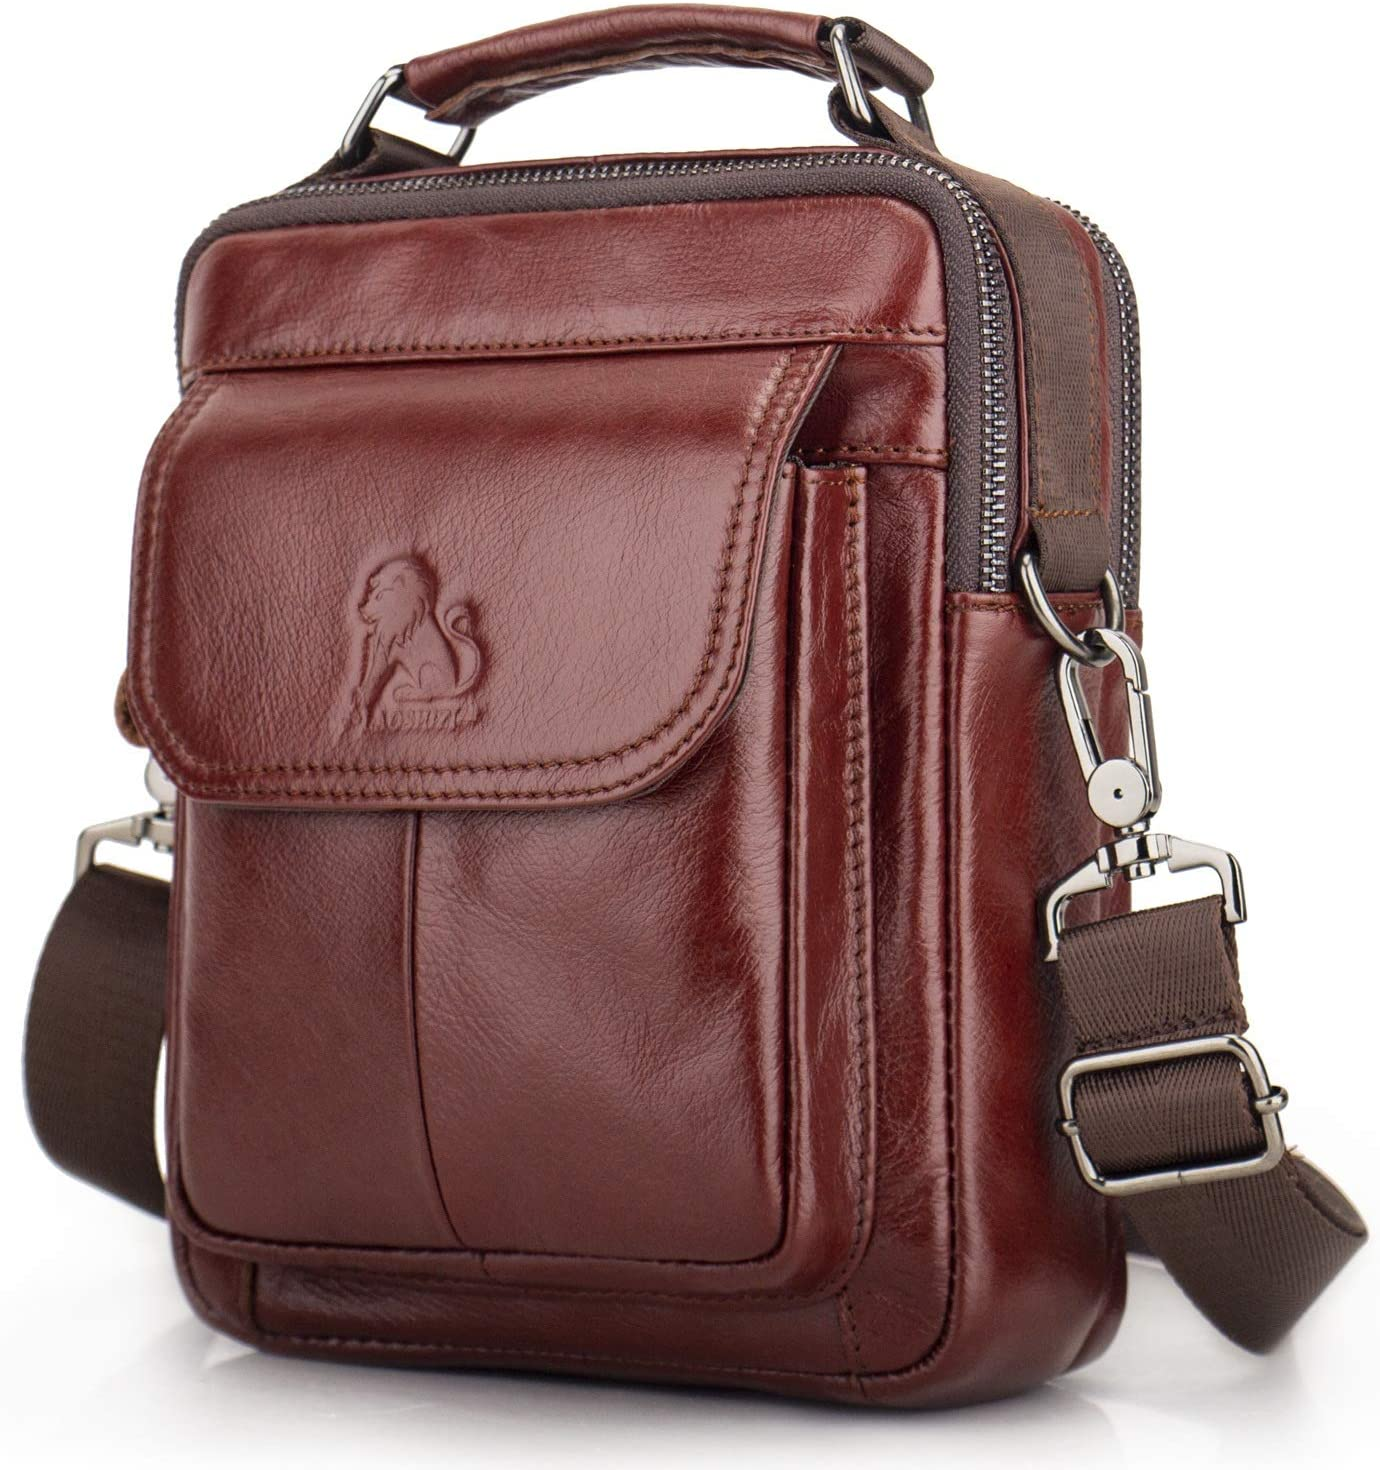 LAOSHIZI Genuine Leather Men Messenger Bags Retro Small Shoulder Crossbody Bag Handbags (Red-brown)